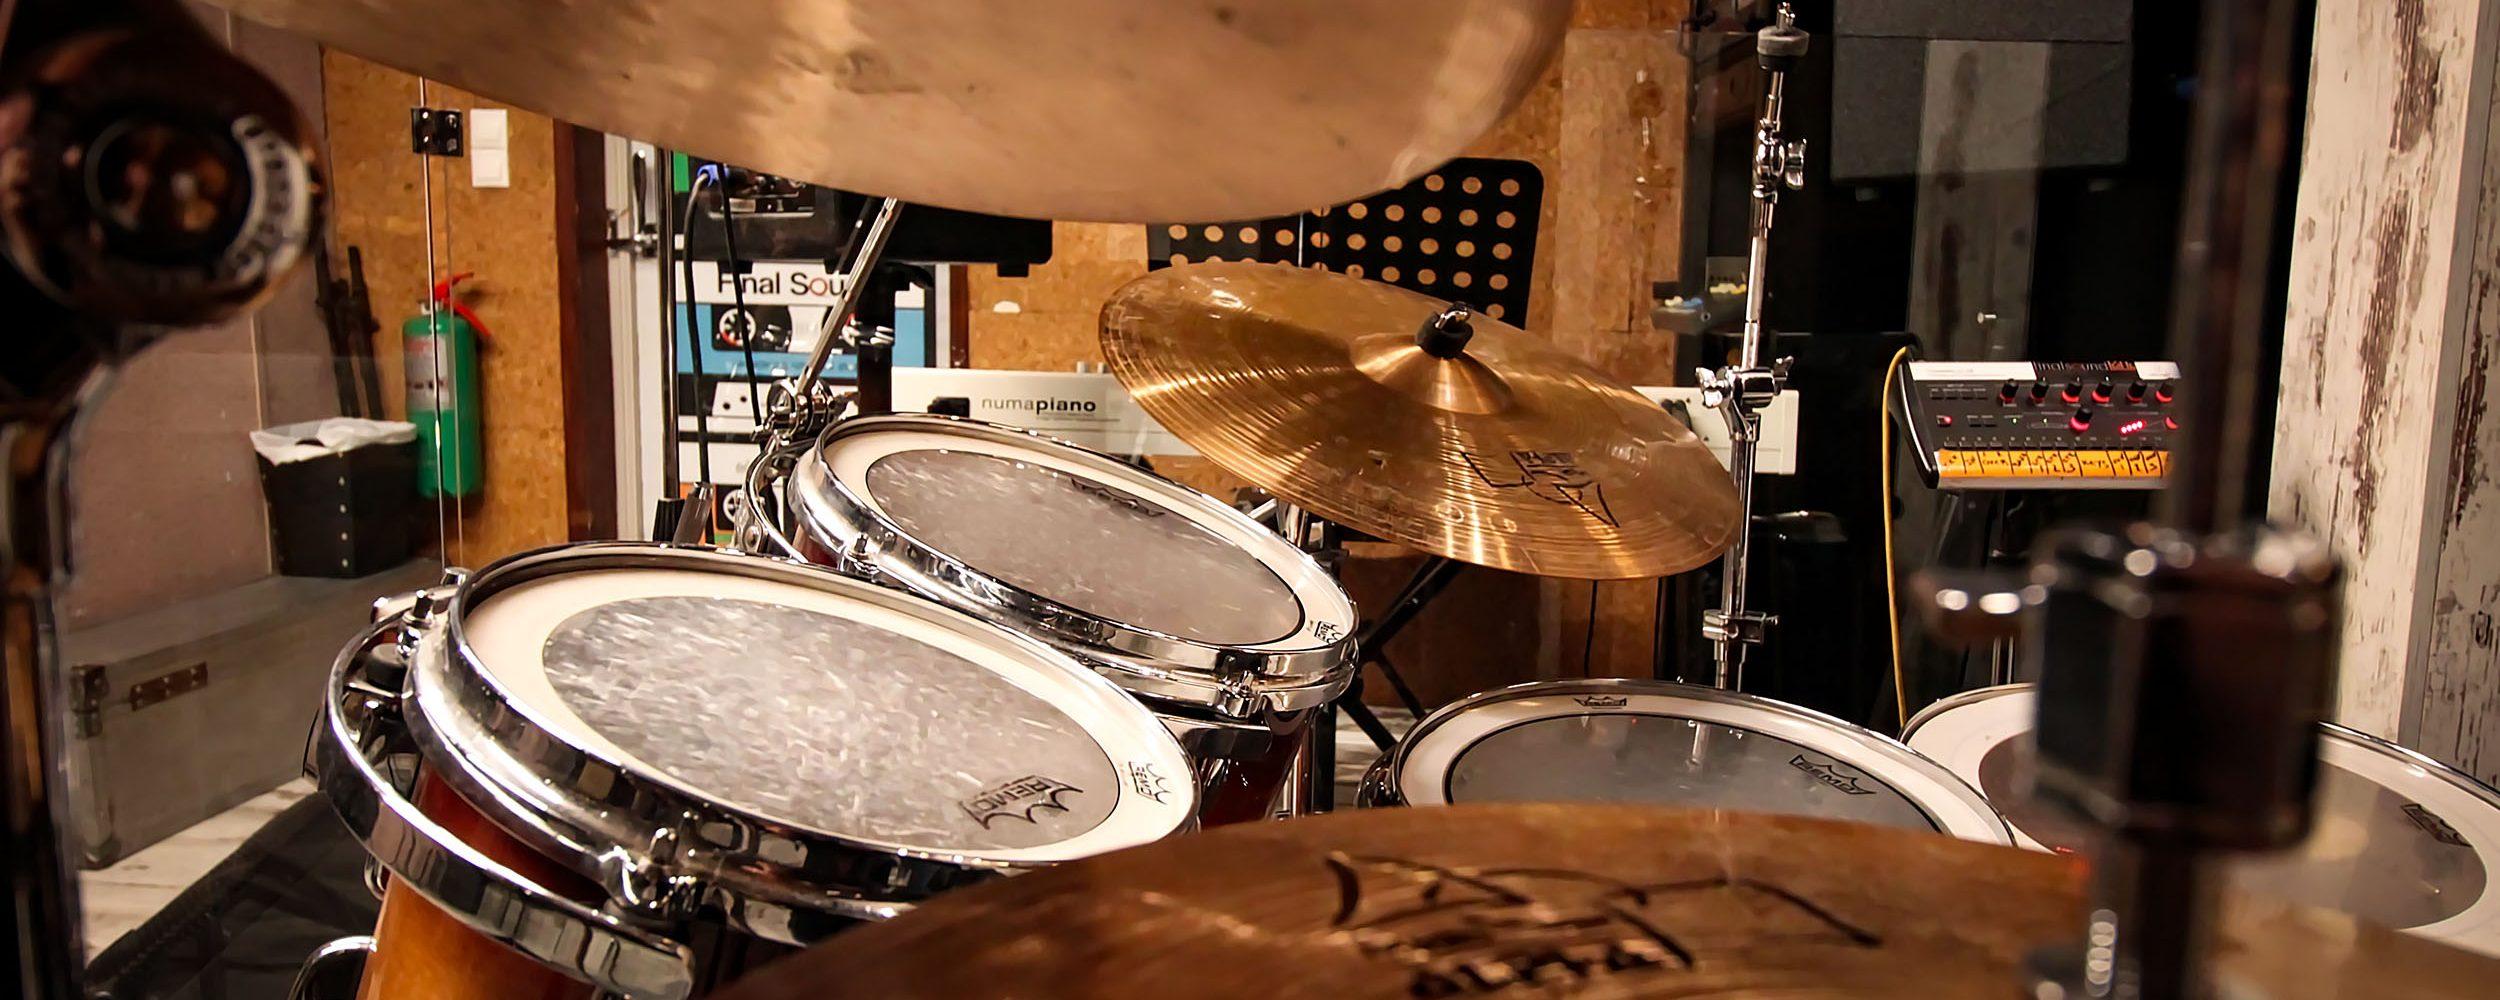 Final Sound Rehearsal 32